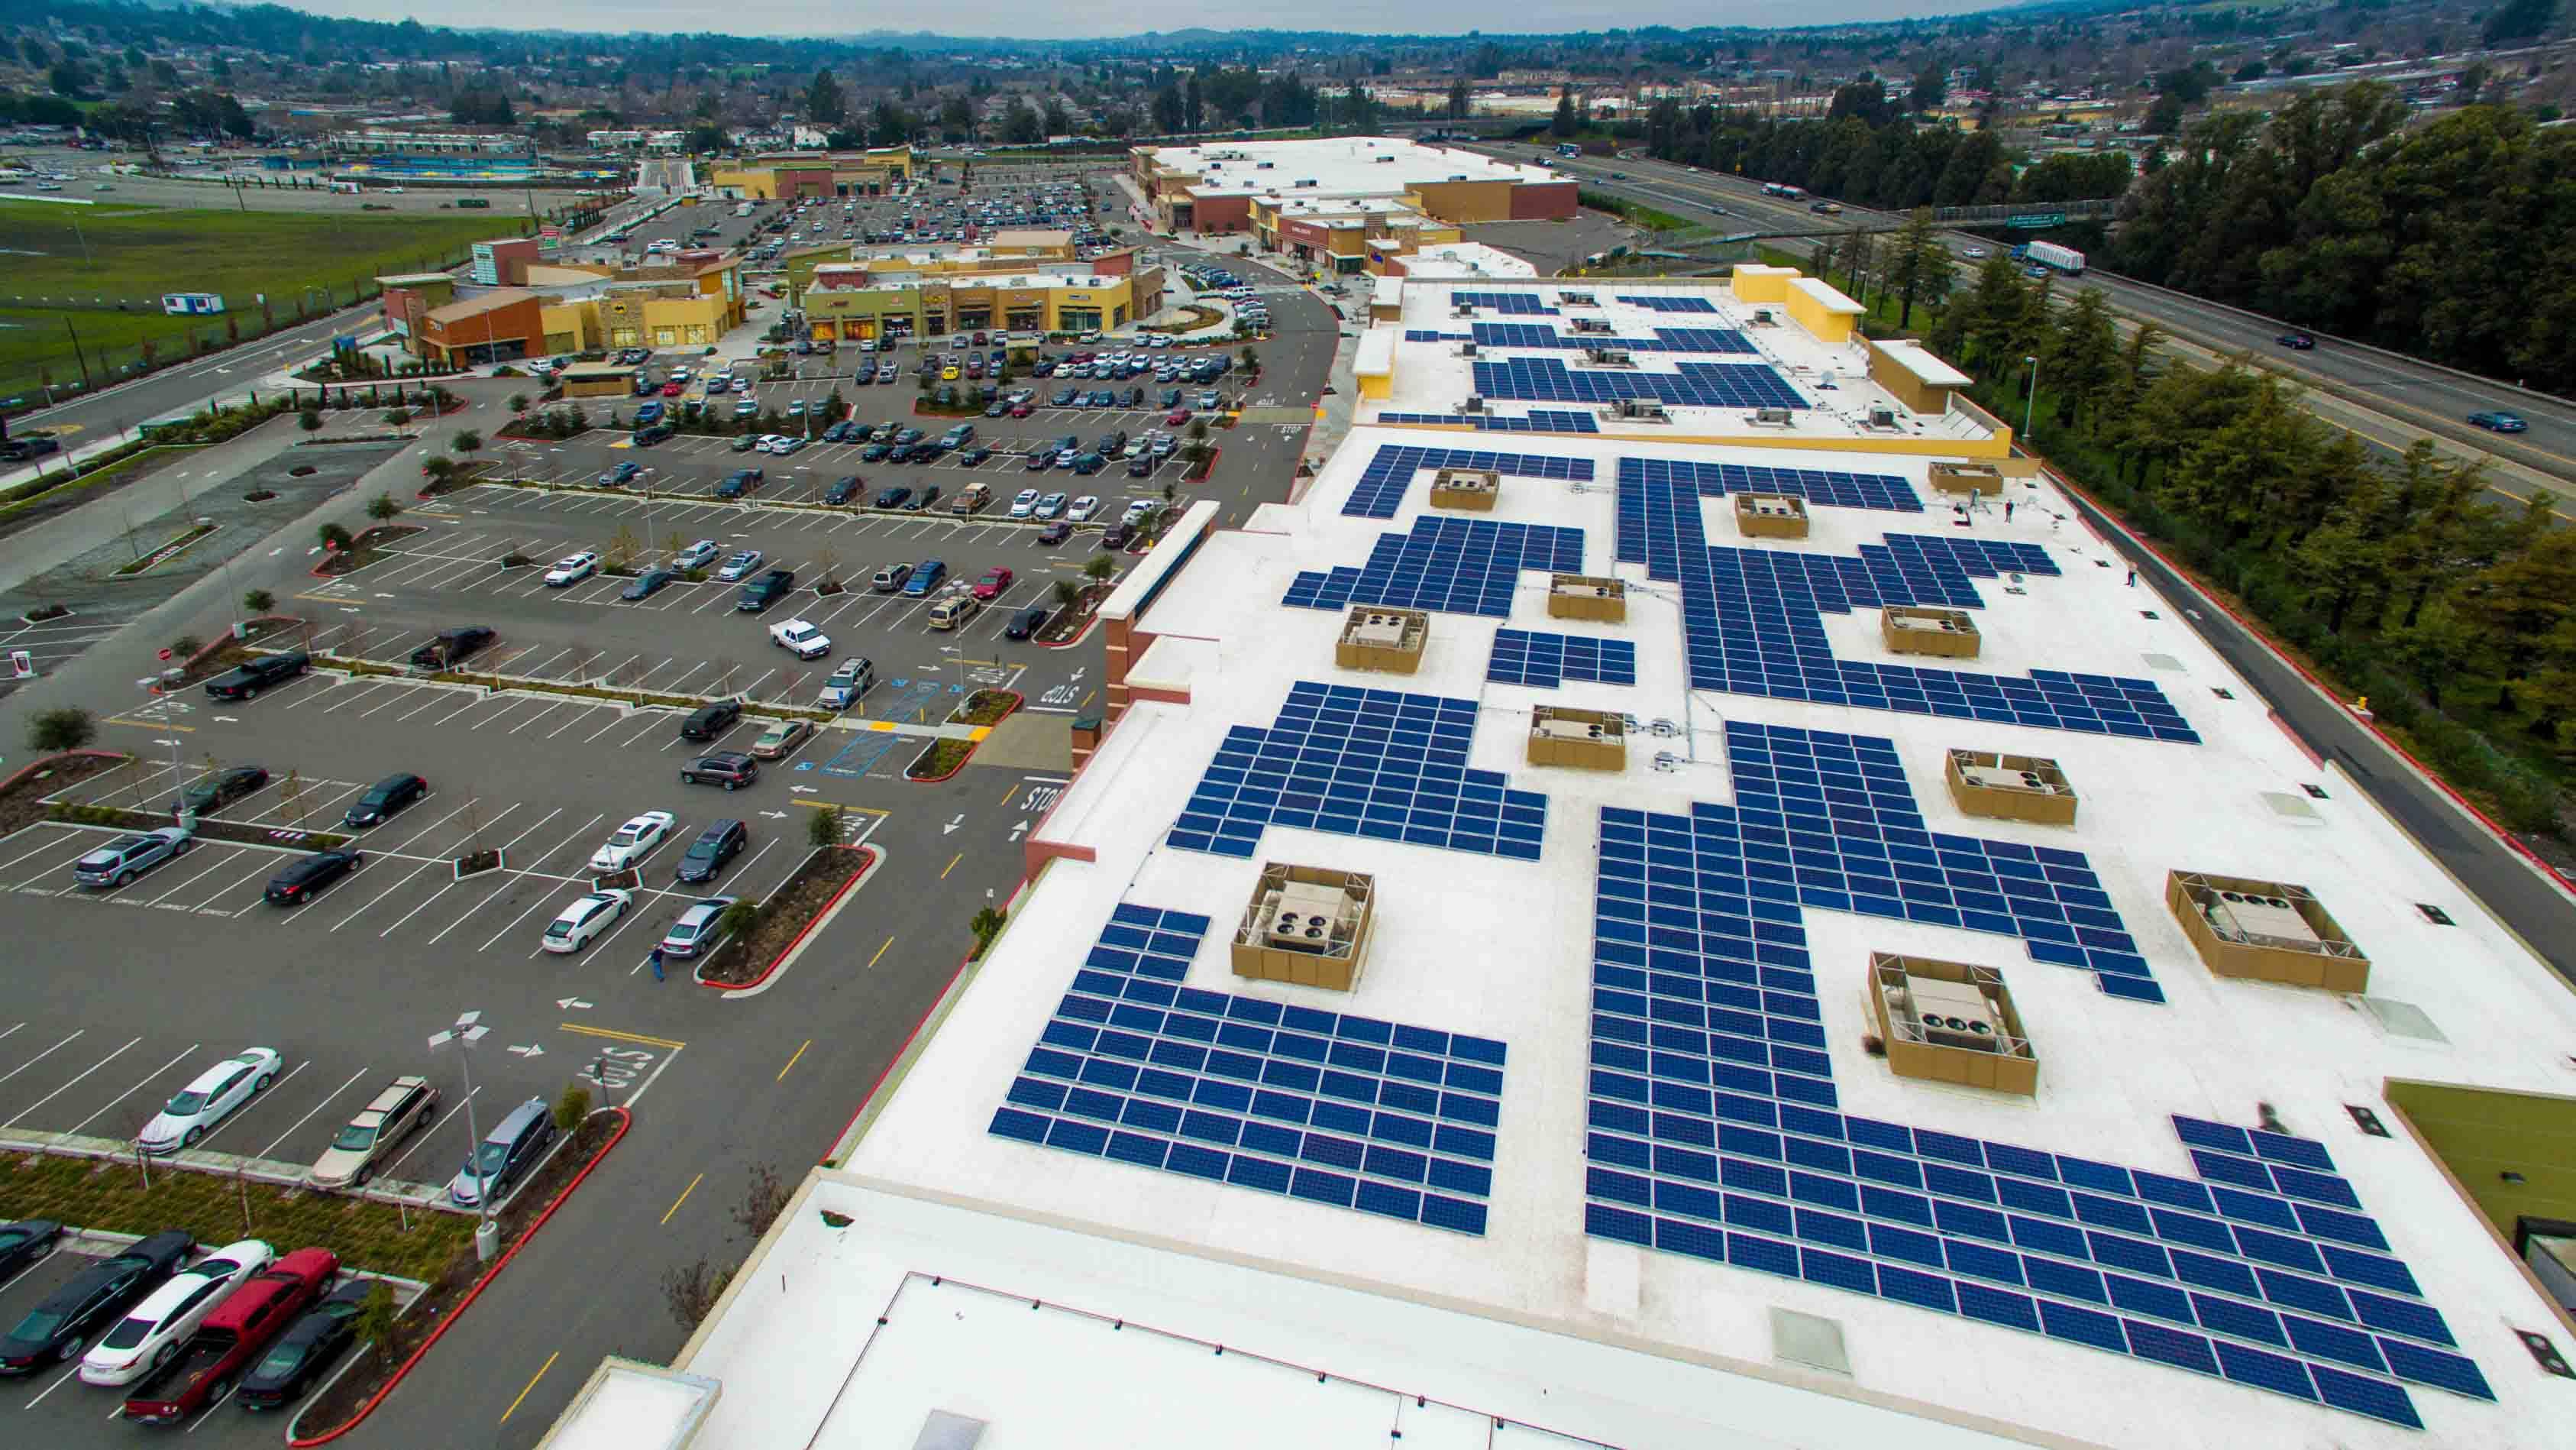 Regency Regency Centers Adds Rooftop Solar In California